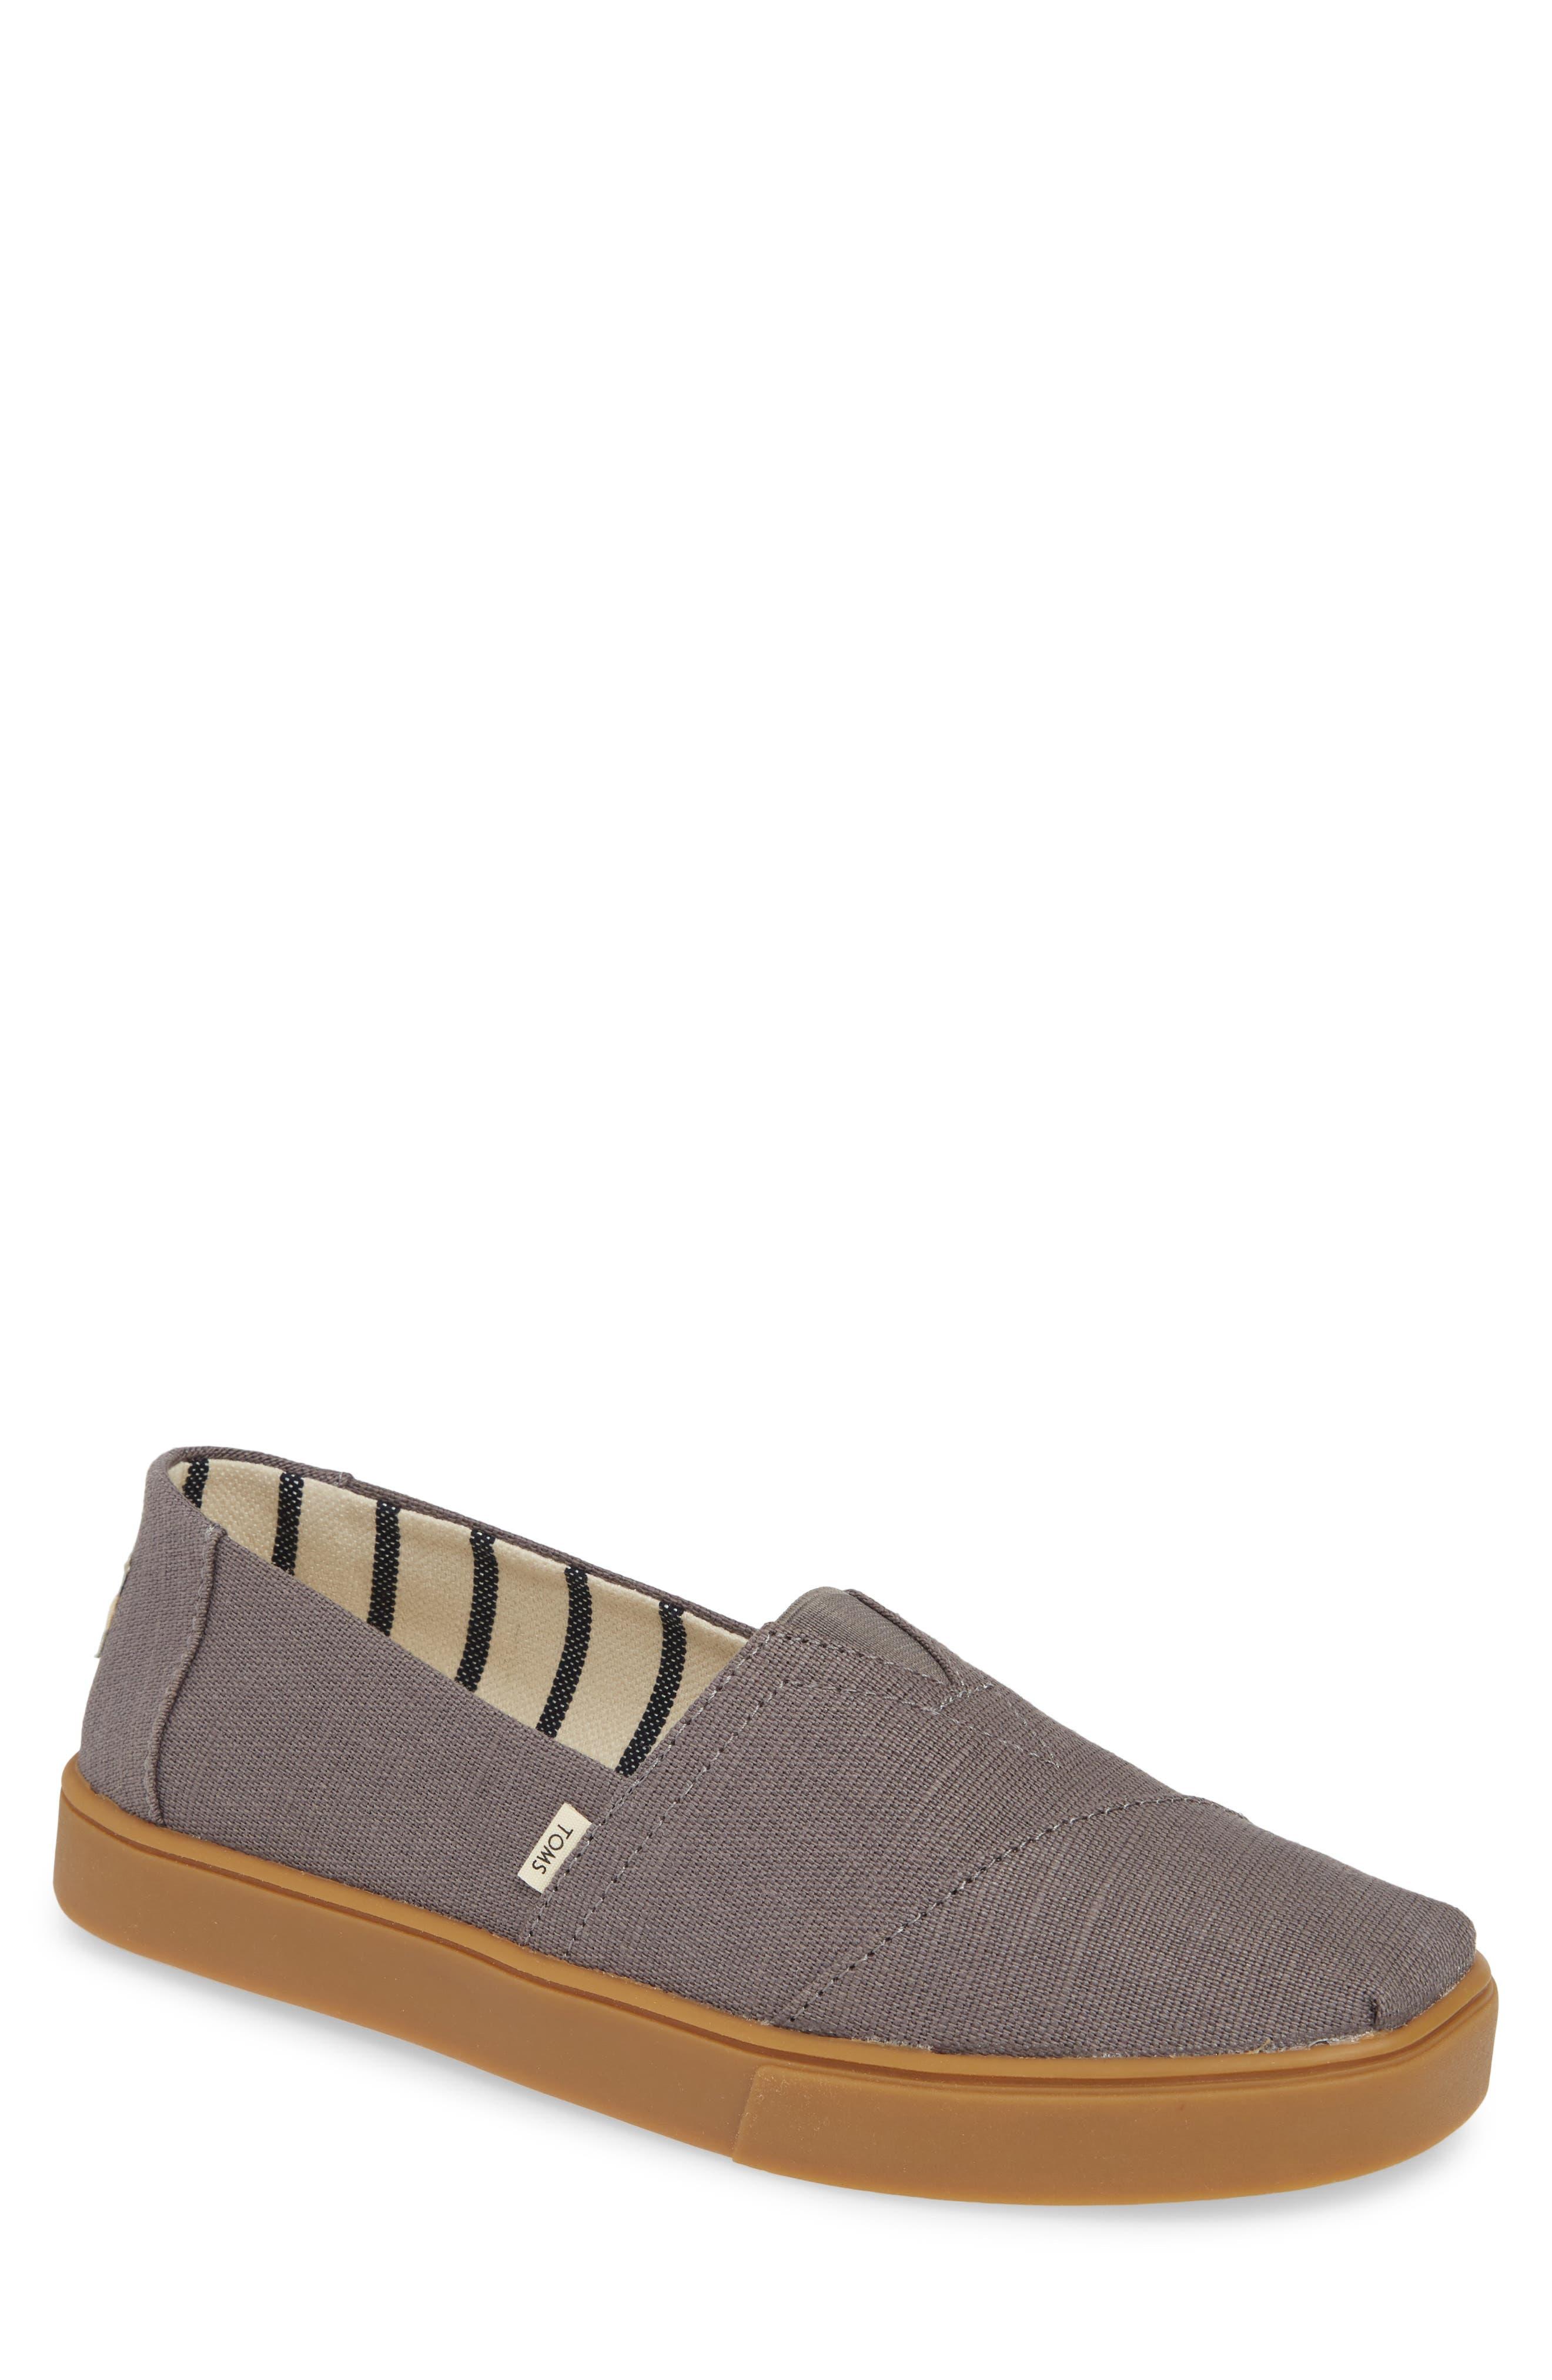 Toms Alpargata Cupsole Slip-On, Grey